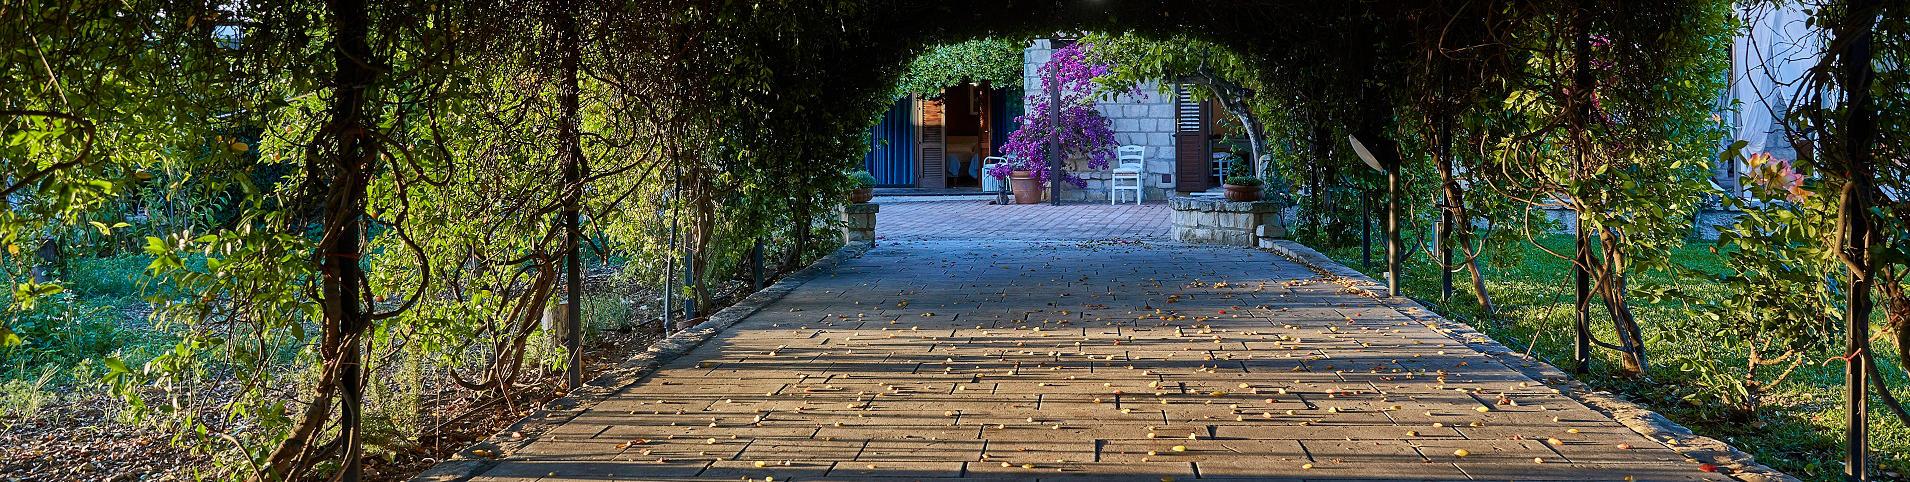 sicily no1 holiday rentals website - Villa Rental Sicily